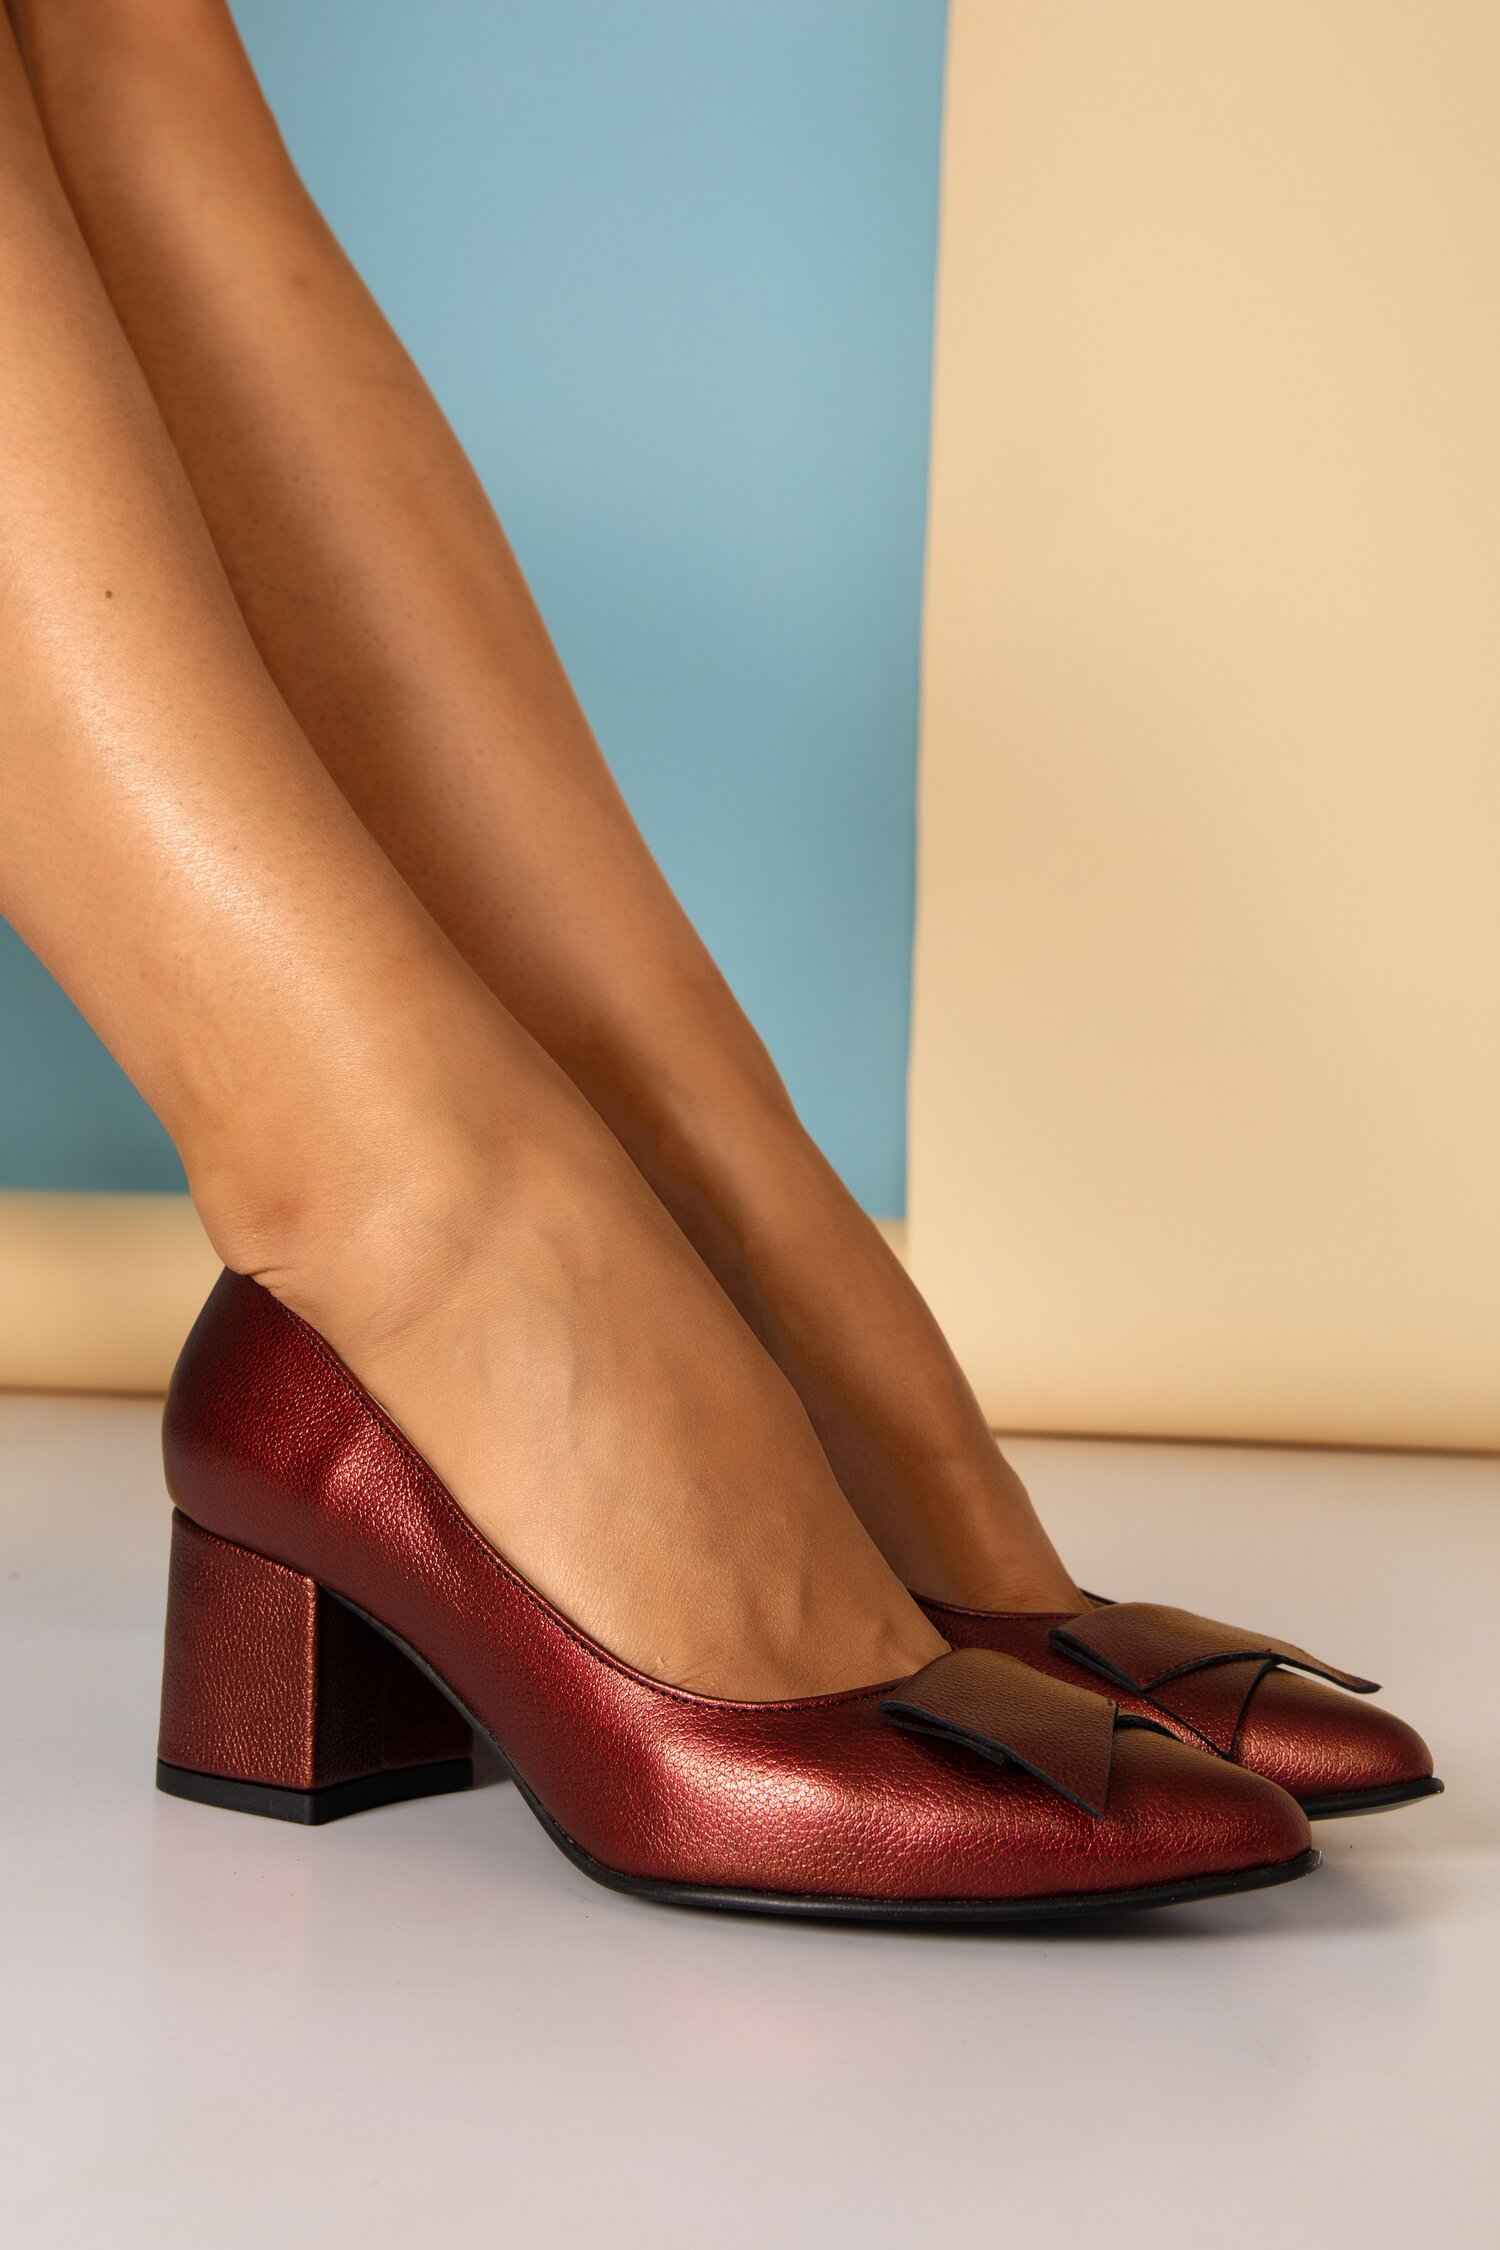 Pantofi bordo sidefati cu detaliu aplicat imagine